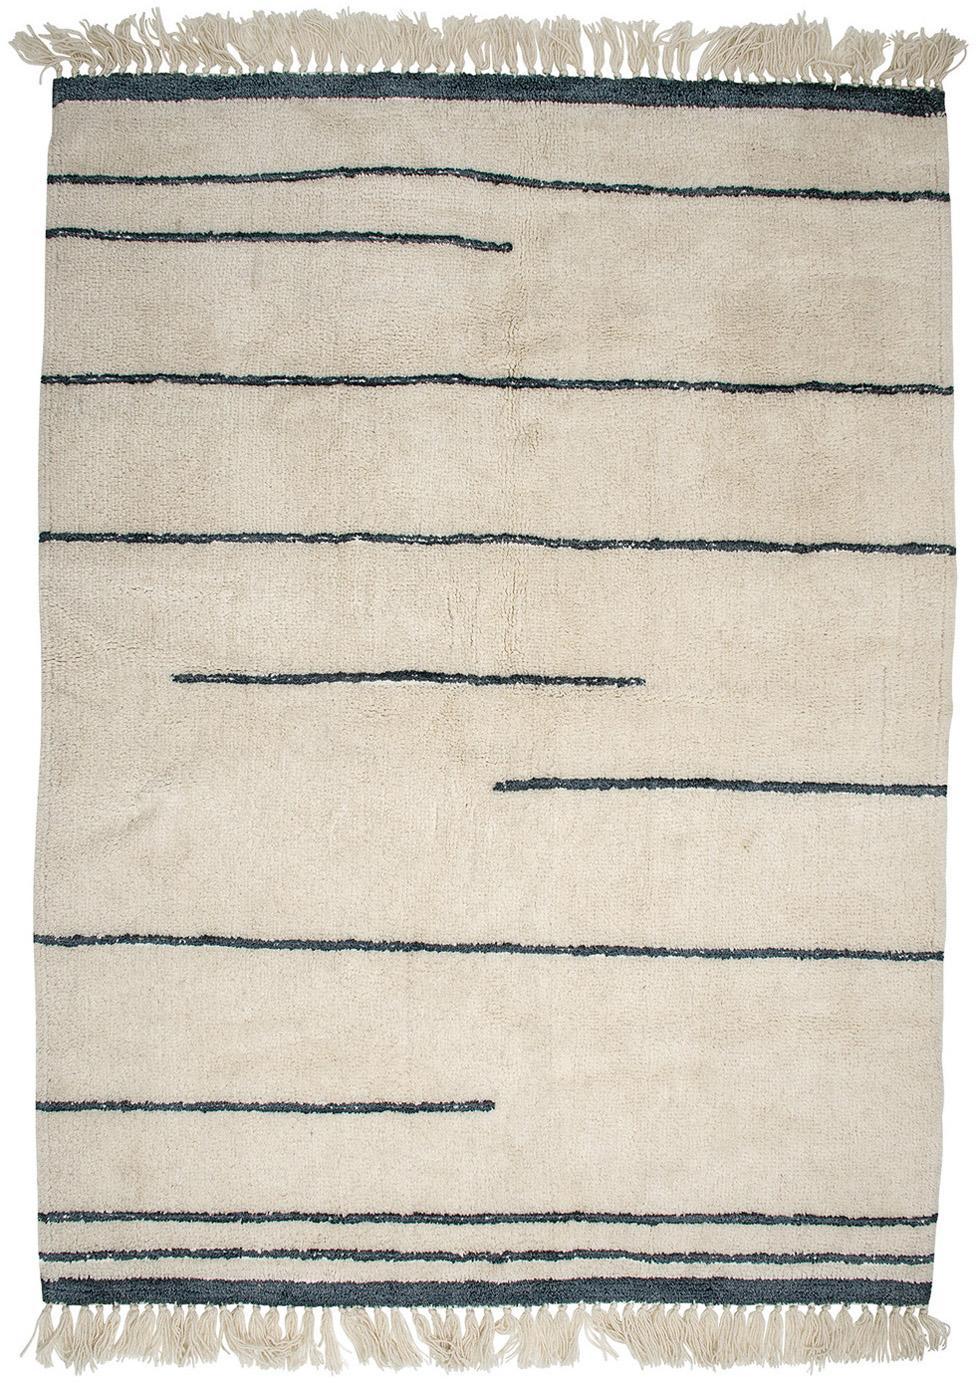 Alfombra de lana con flecos Nora, Beige, antracita, An 140 x L 200 cm (Tamaño S)